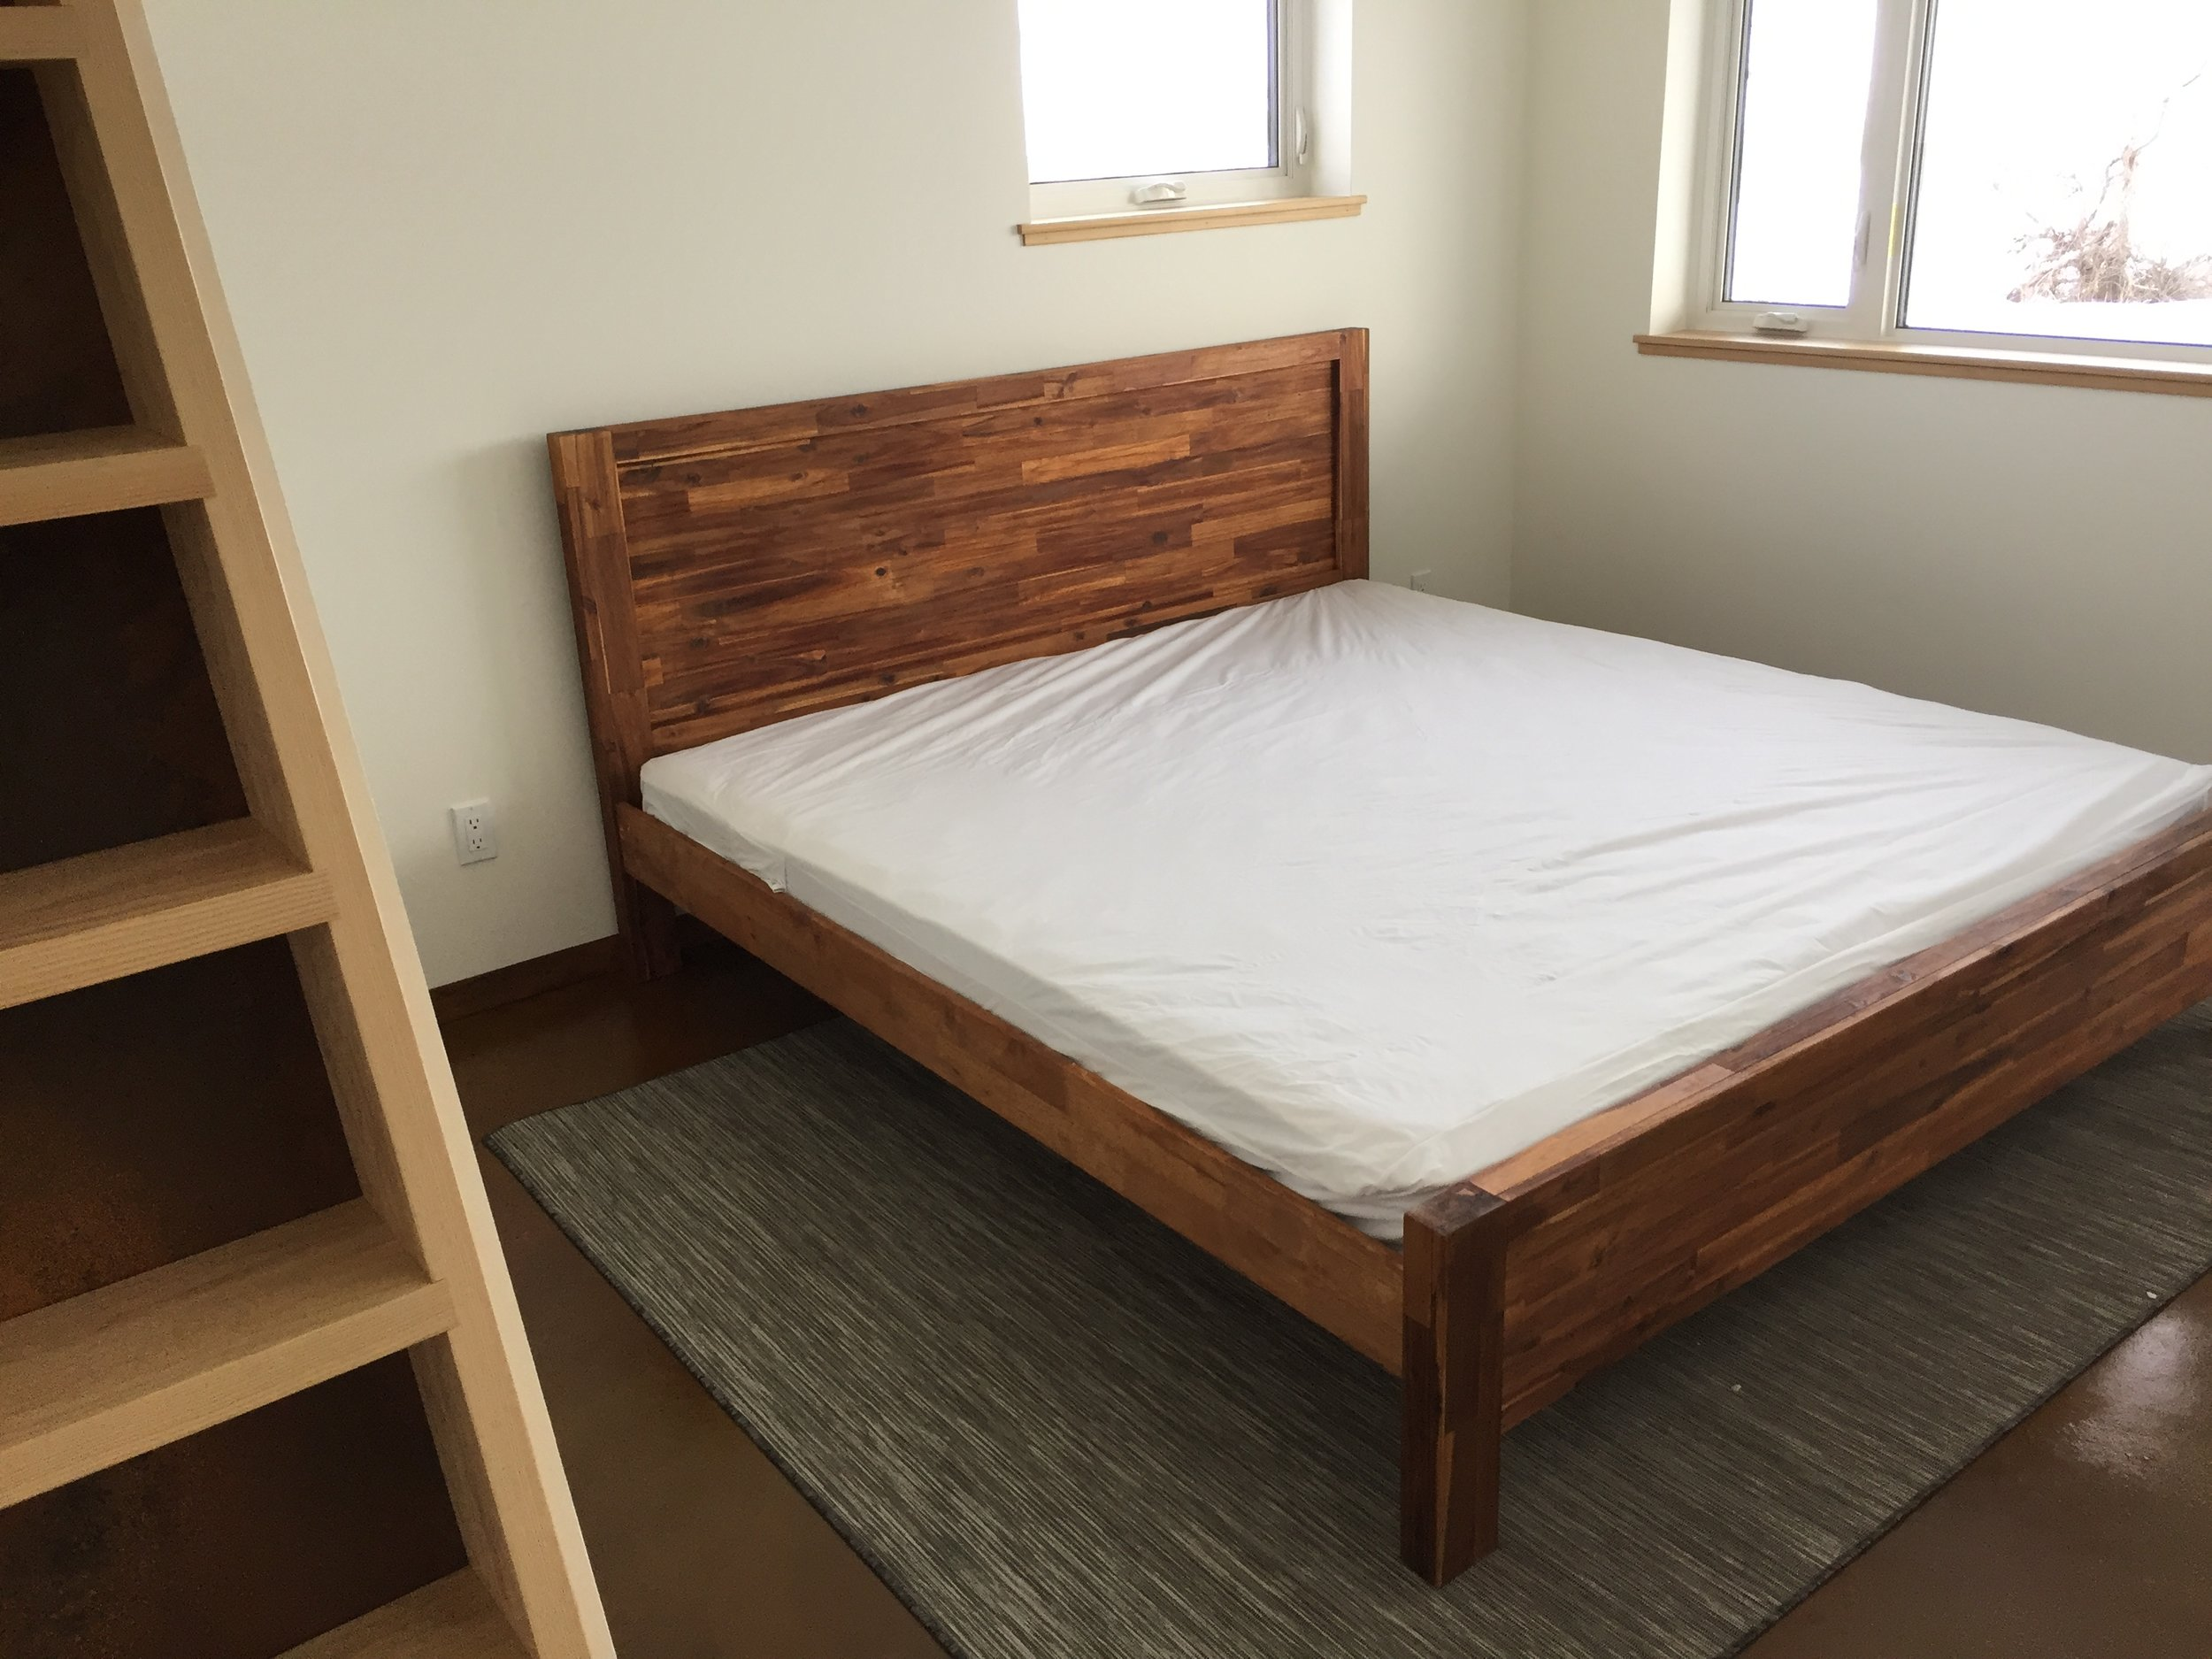 Ultra-comfortable 100% natural latex mattresses.